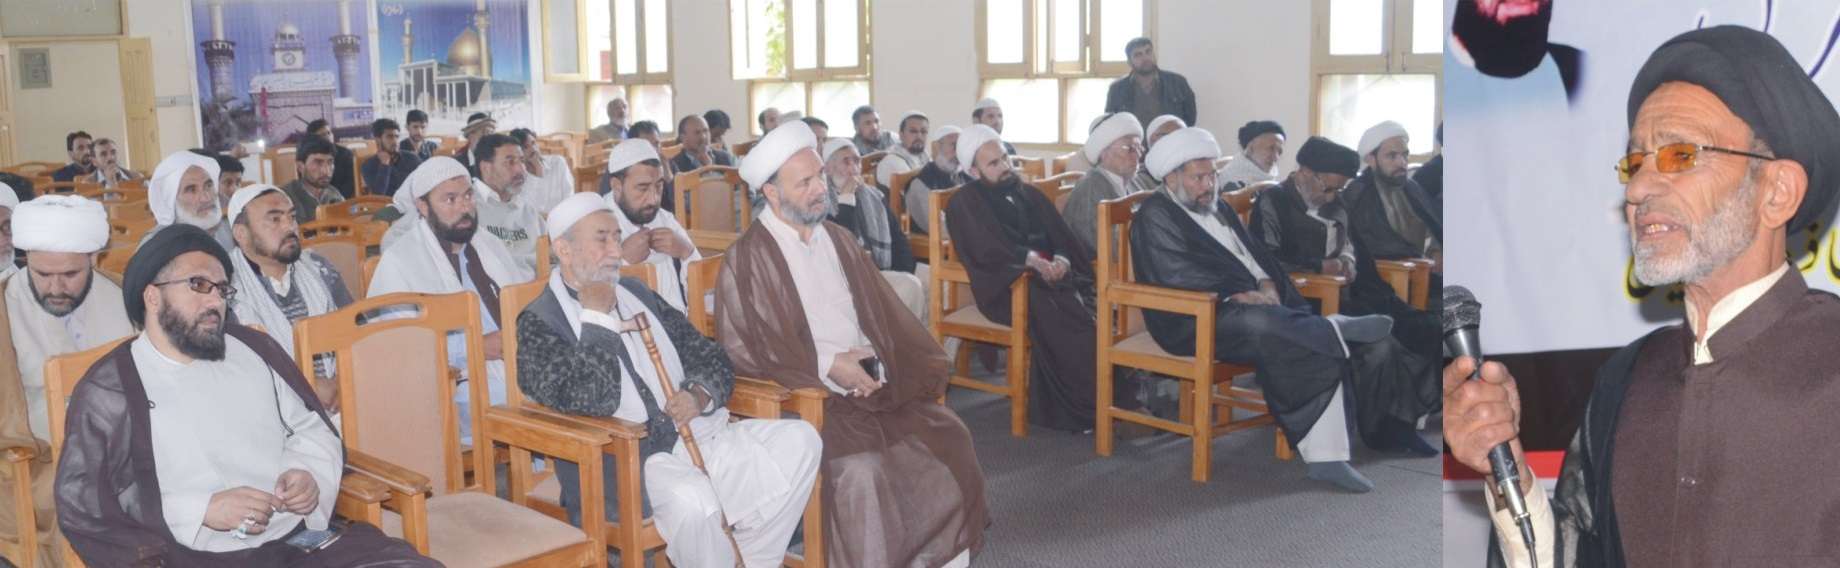 اسلامی تحریک پاکستان بلتستان کے زیر اہتمام عشرہ ولایت کانفرنس کا انعقاد